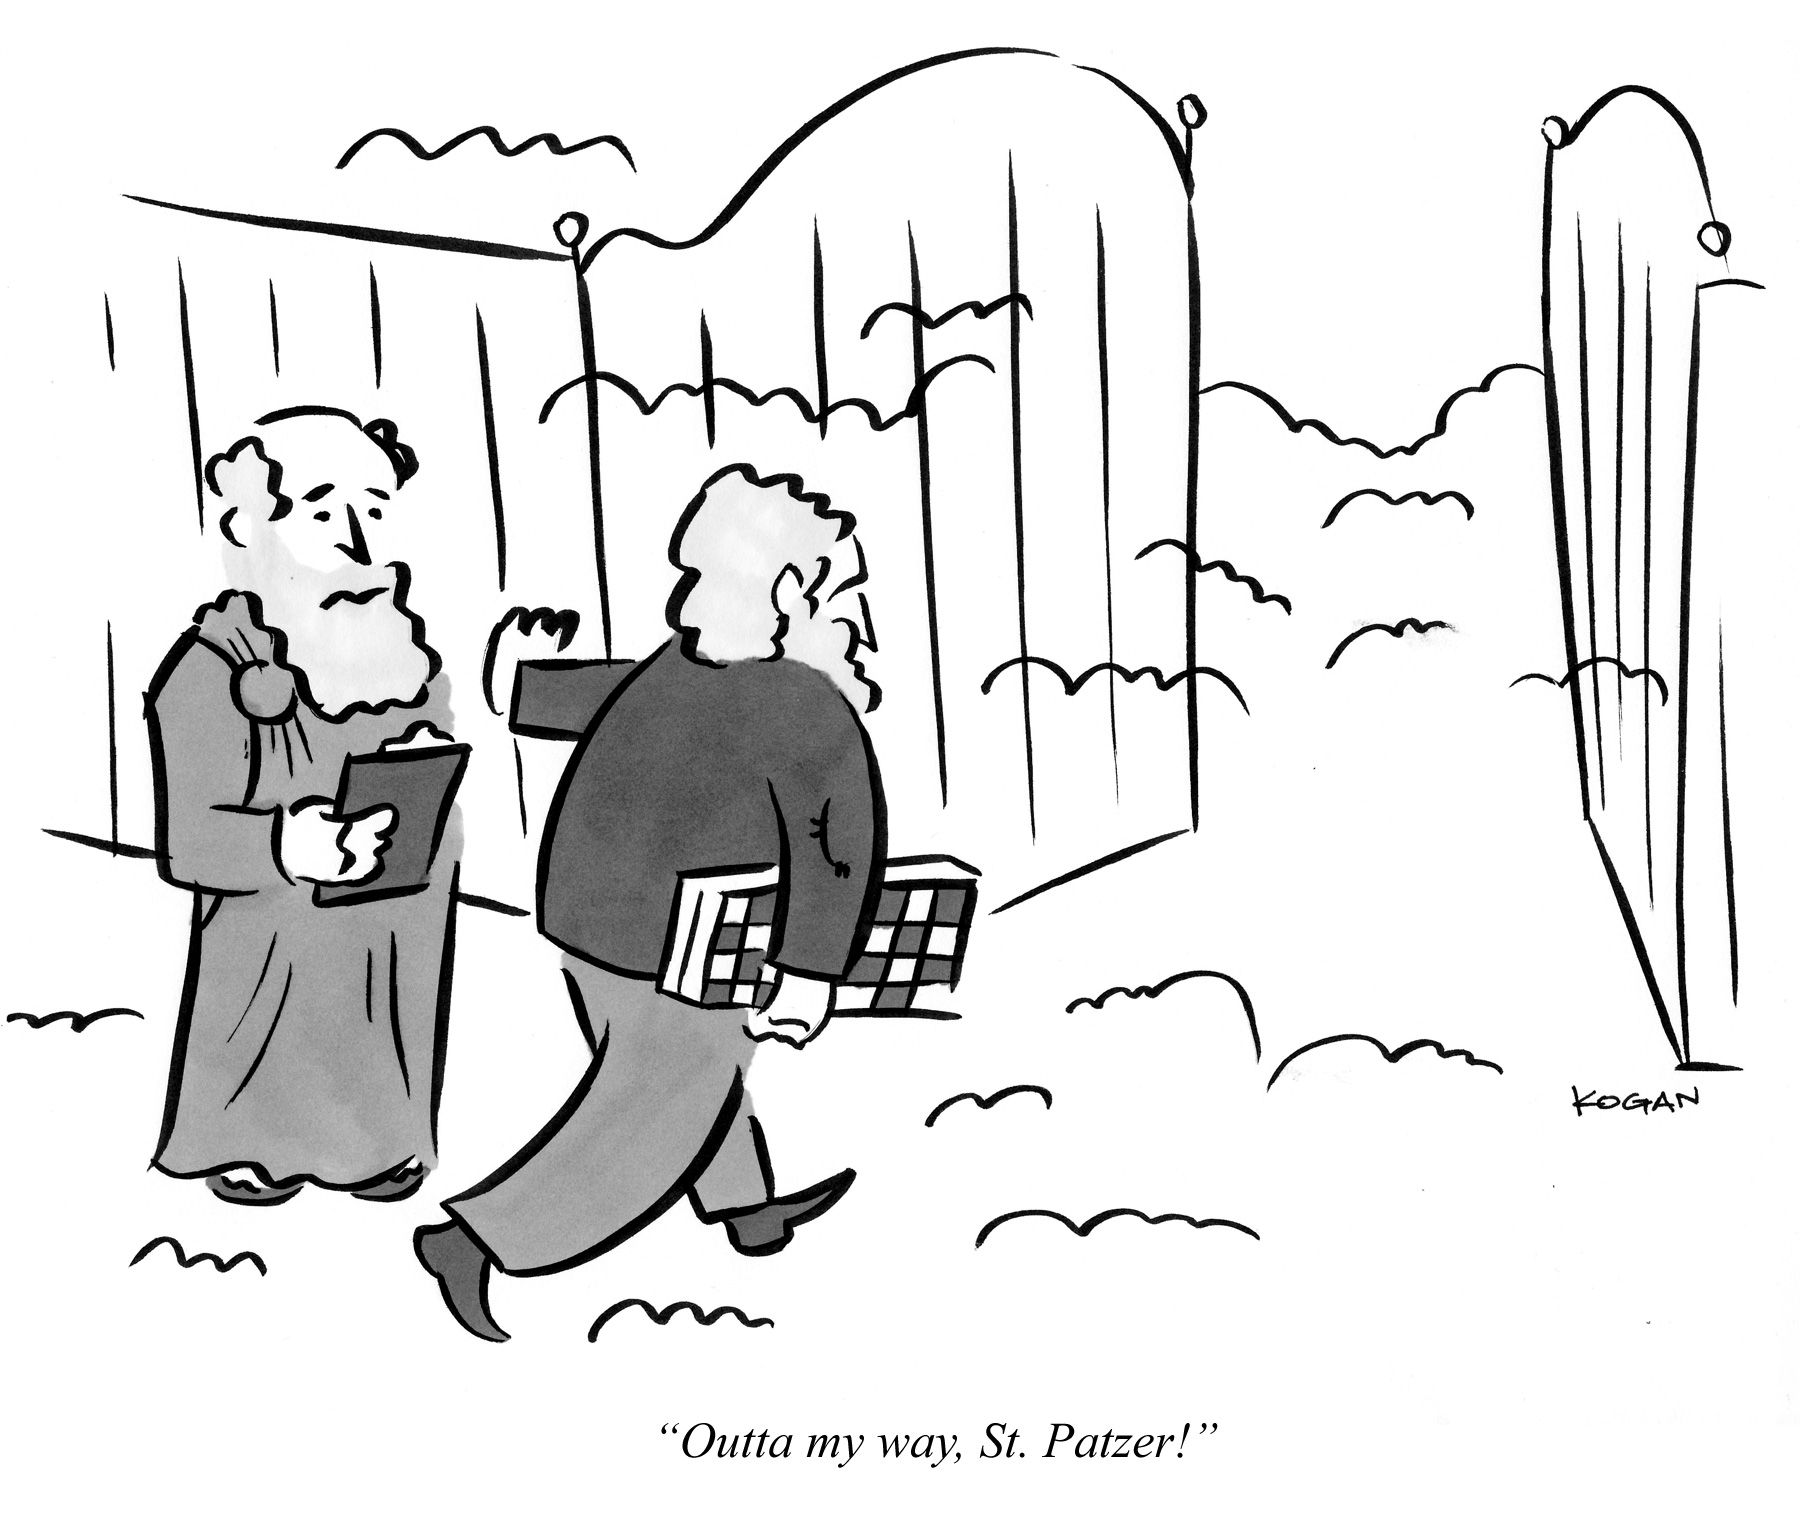 Outta my way, St. Patzer!